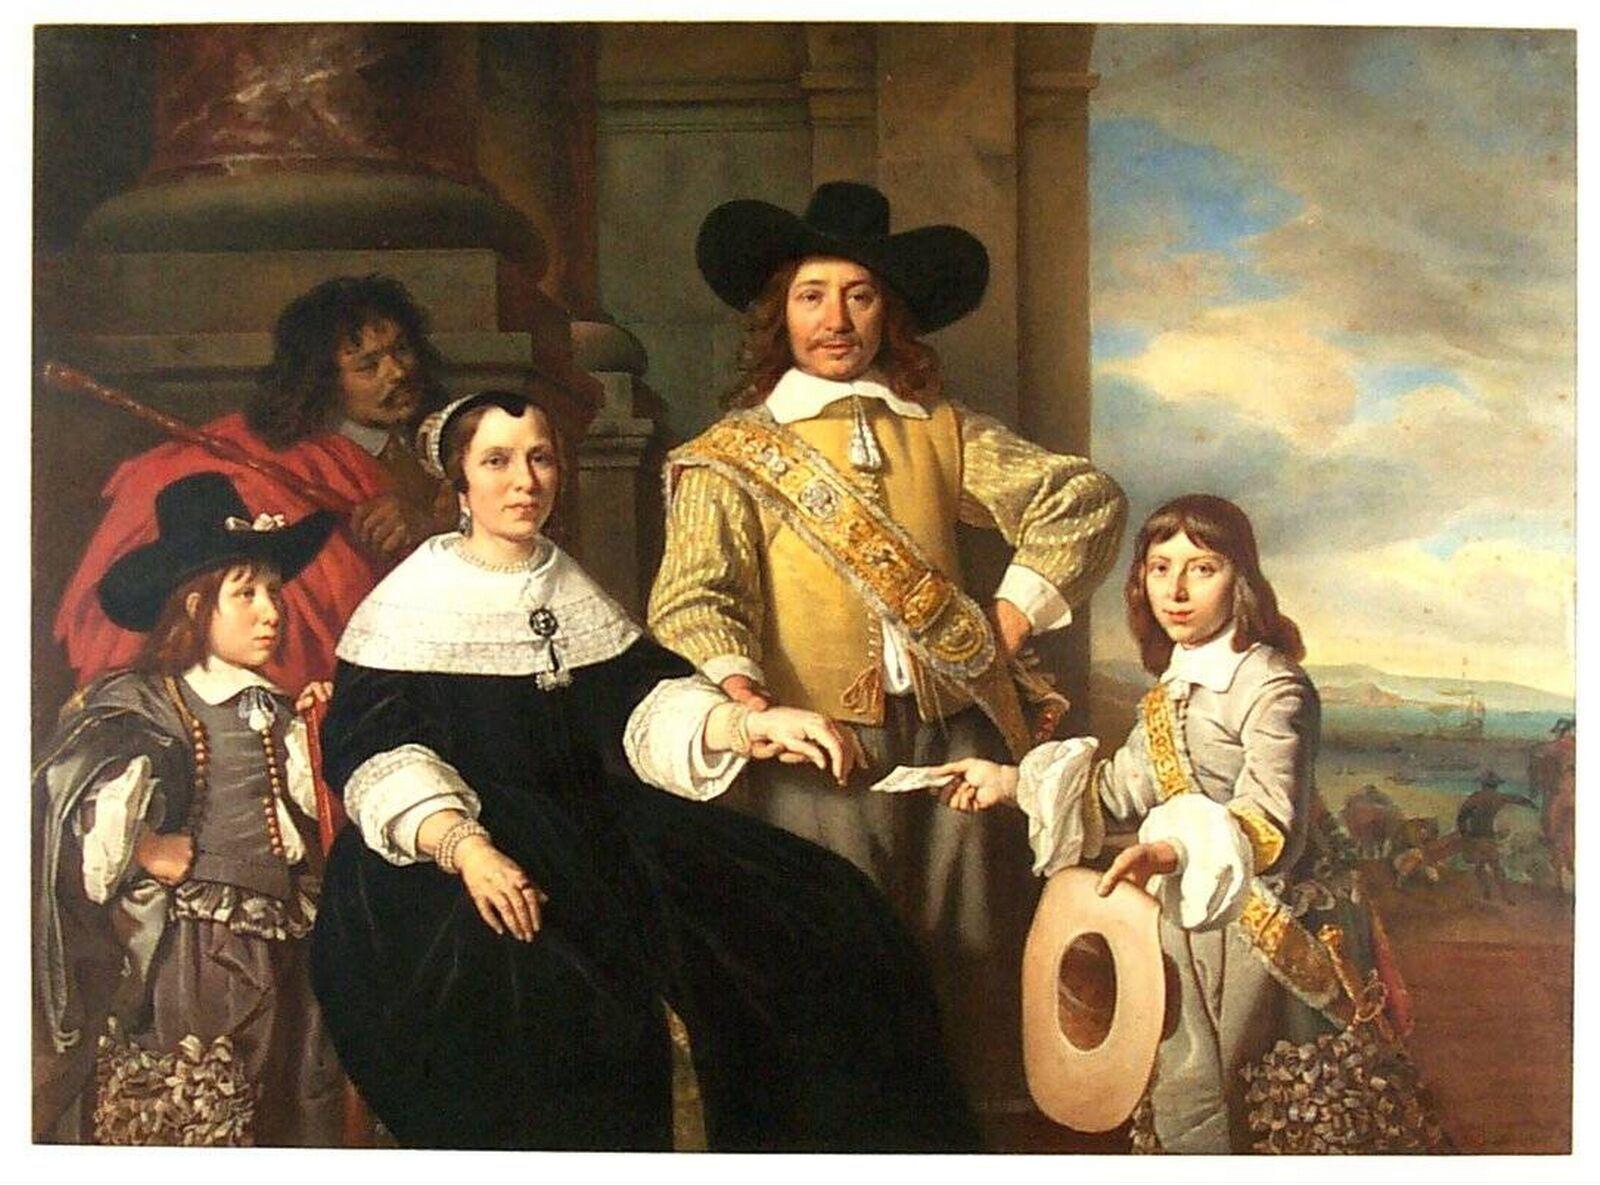 Familyportrait of Rijcklof Volckertsz van Goens (1619-1682), Governor of the Vereenigde Oostindische Compagnie (VOC).